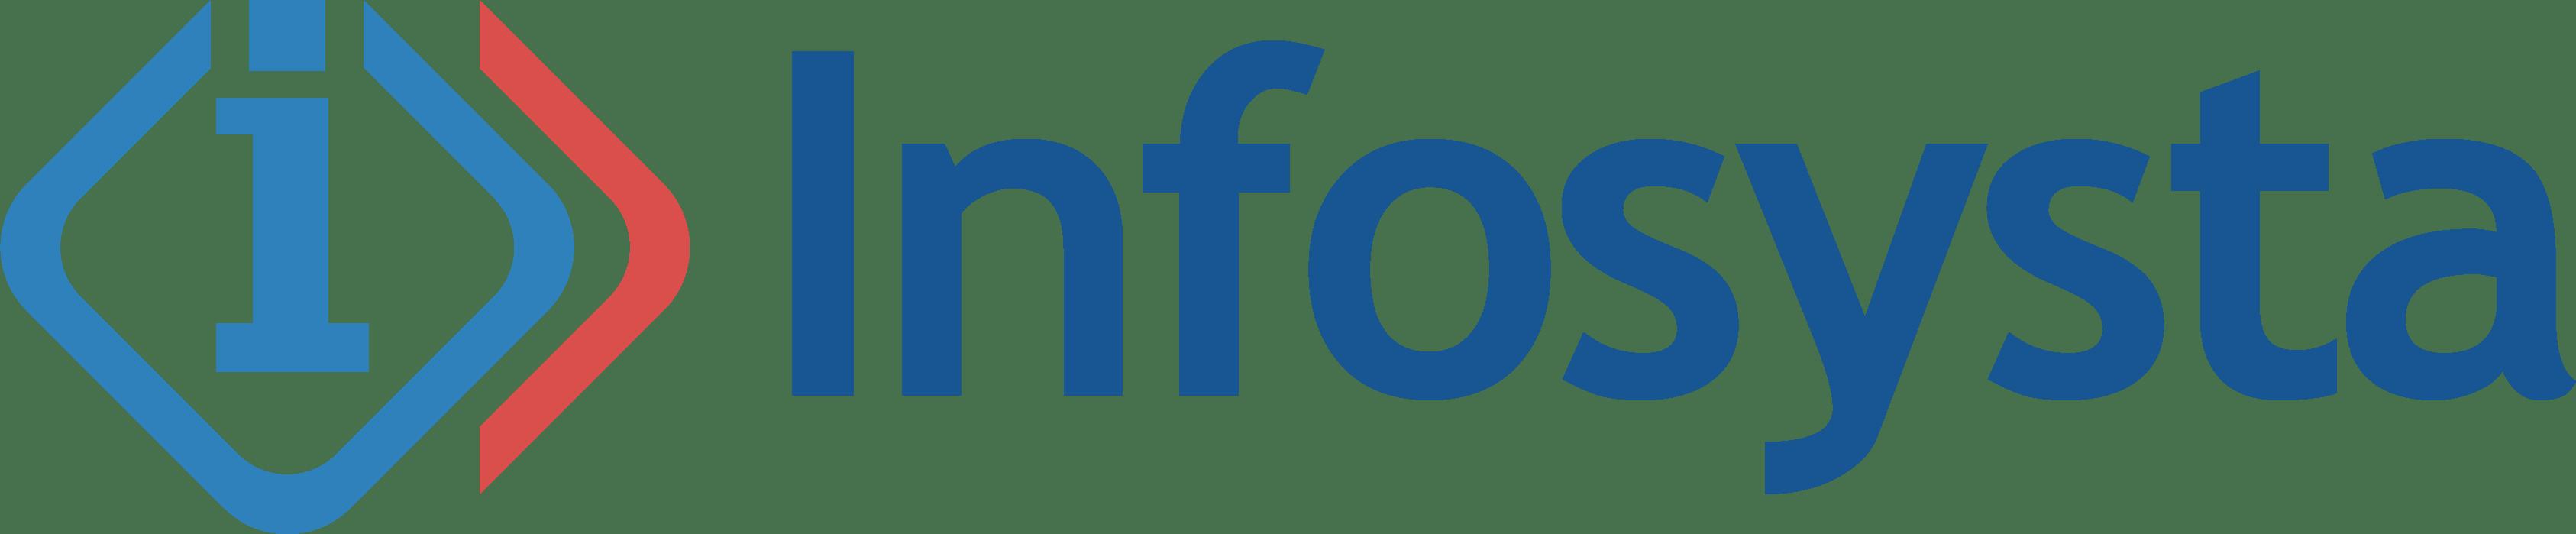 Company logo of Infosysta